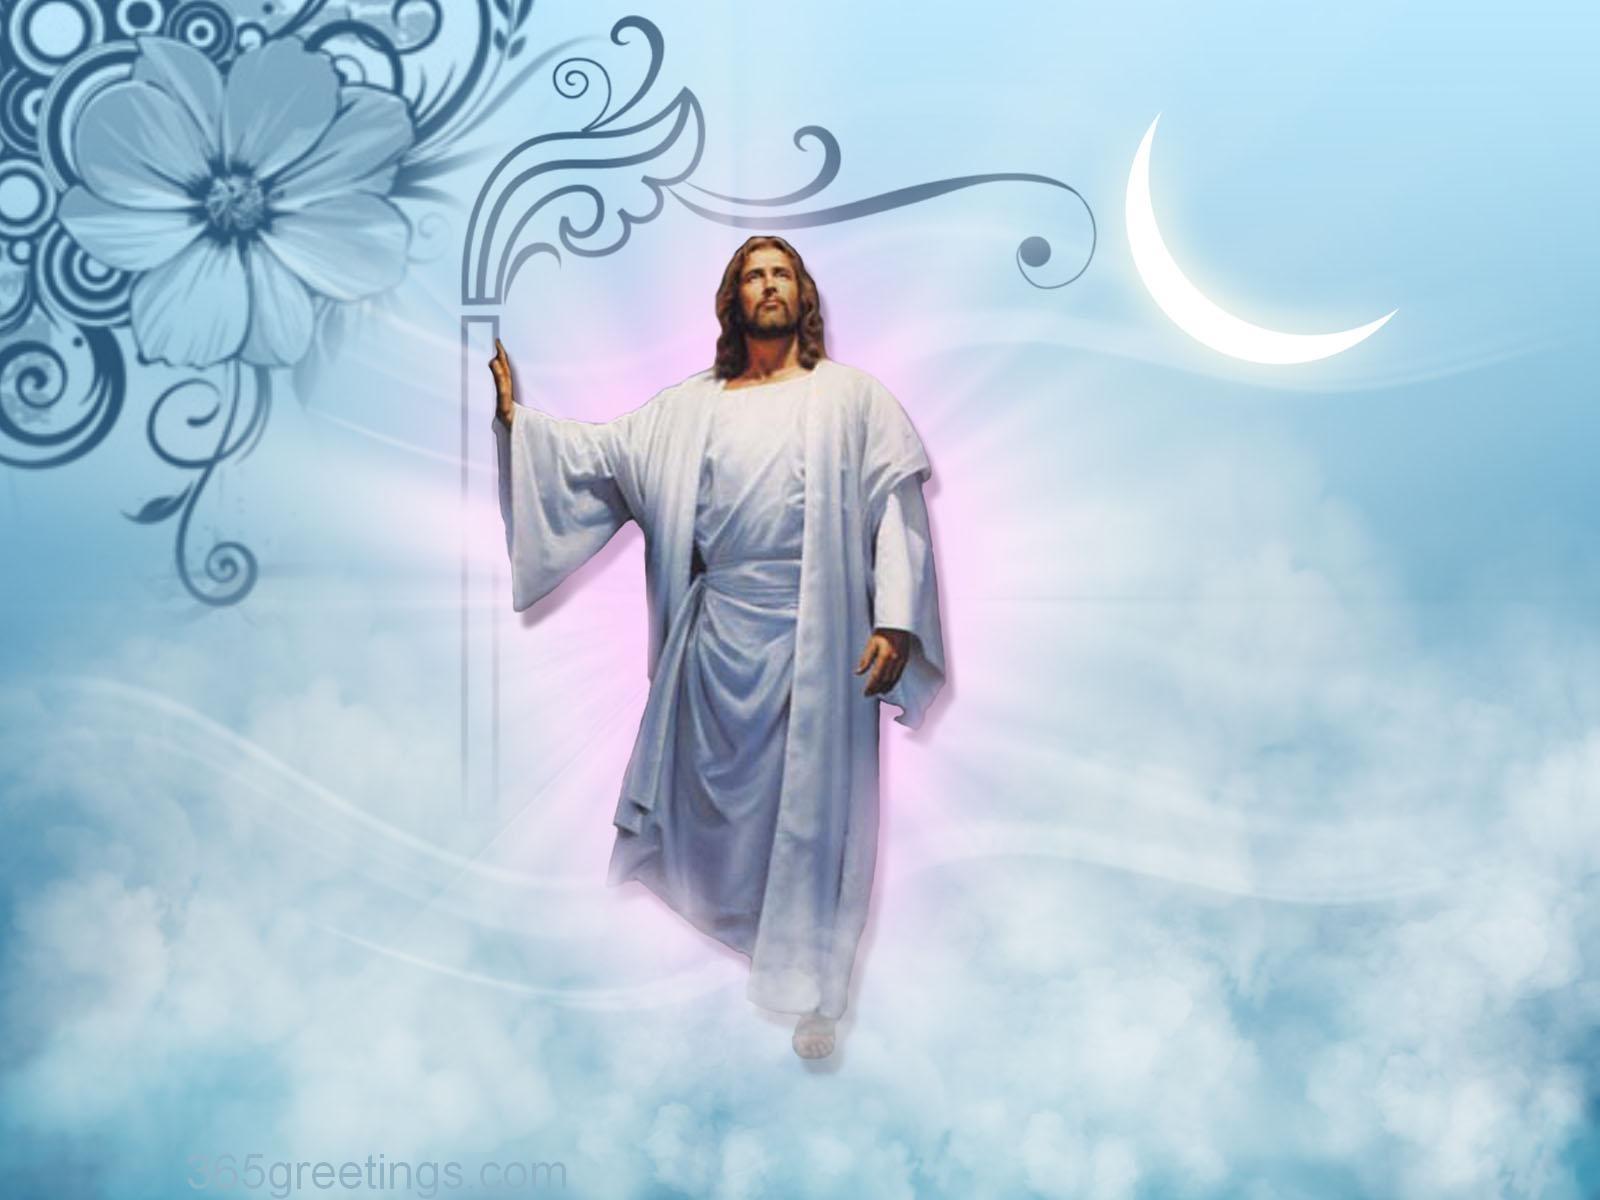 jesus christ god wallpaper laptop backgrounds #10535 wallpaper